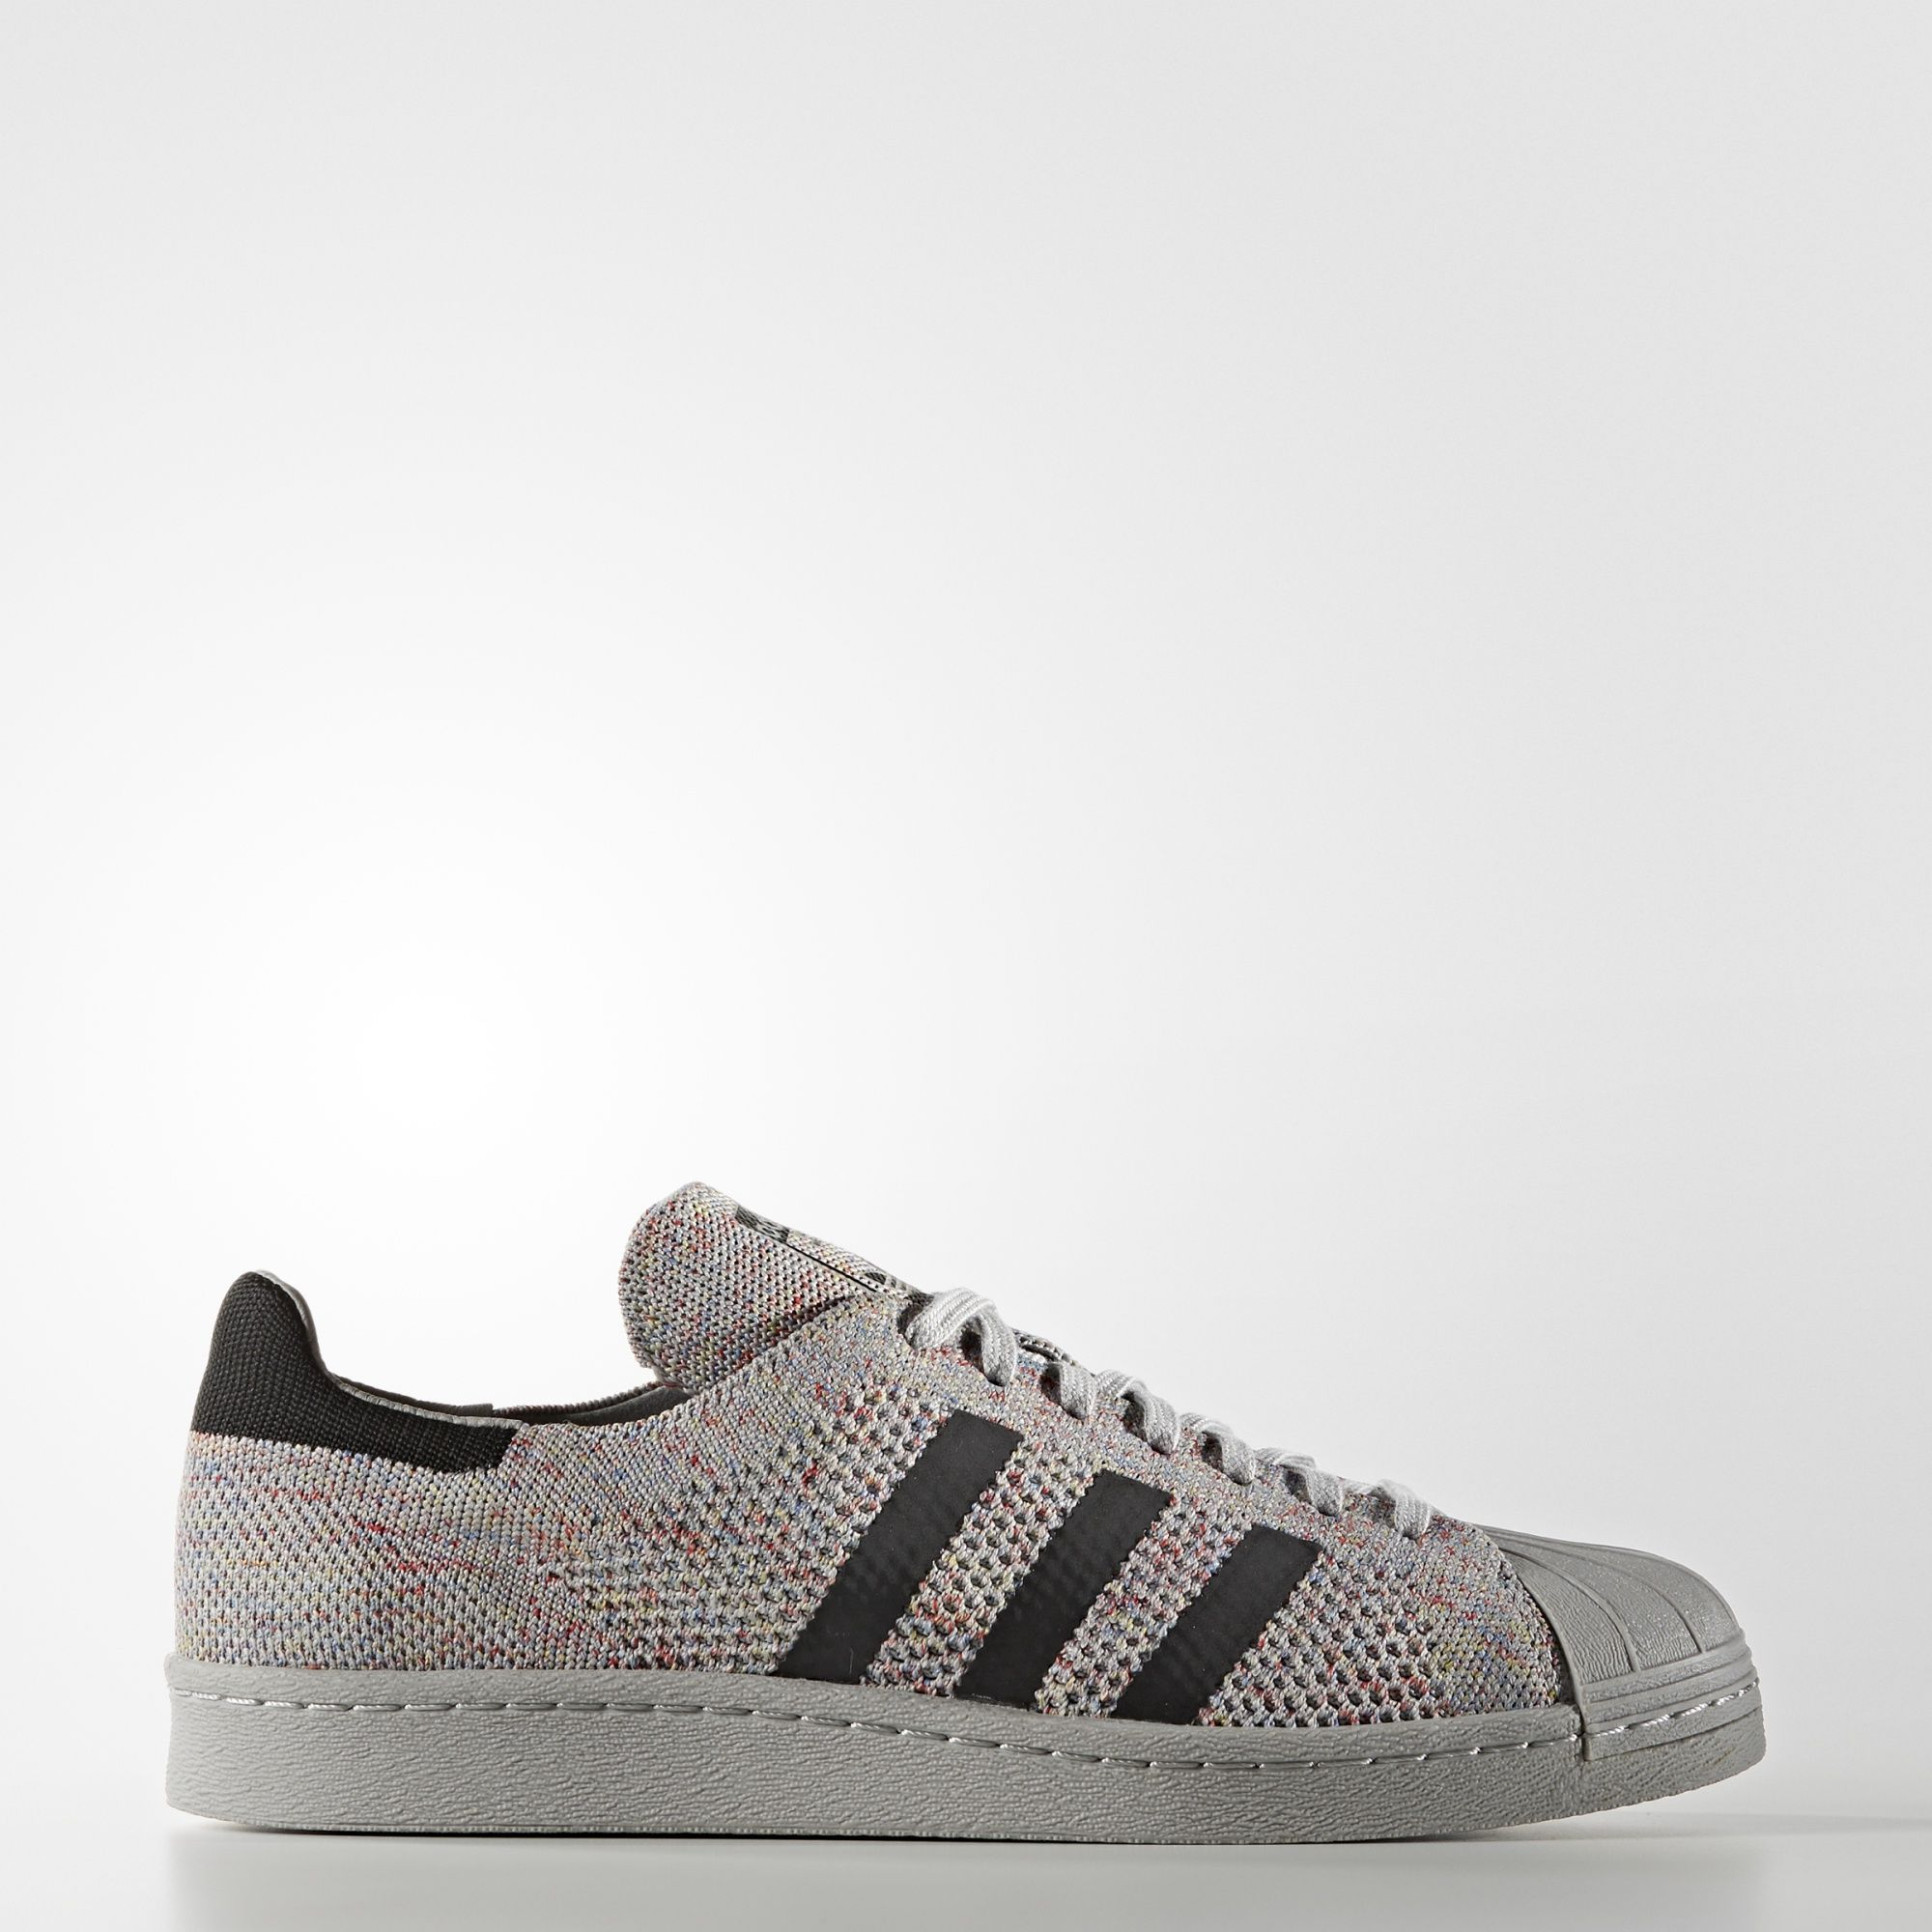 adidas originals superstar 80s primeknit shoes